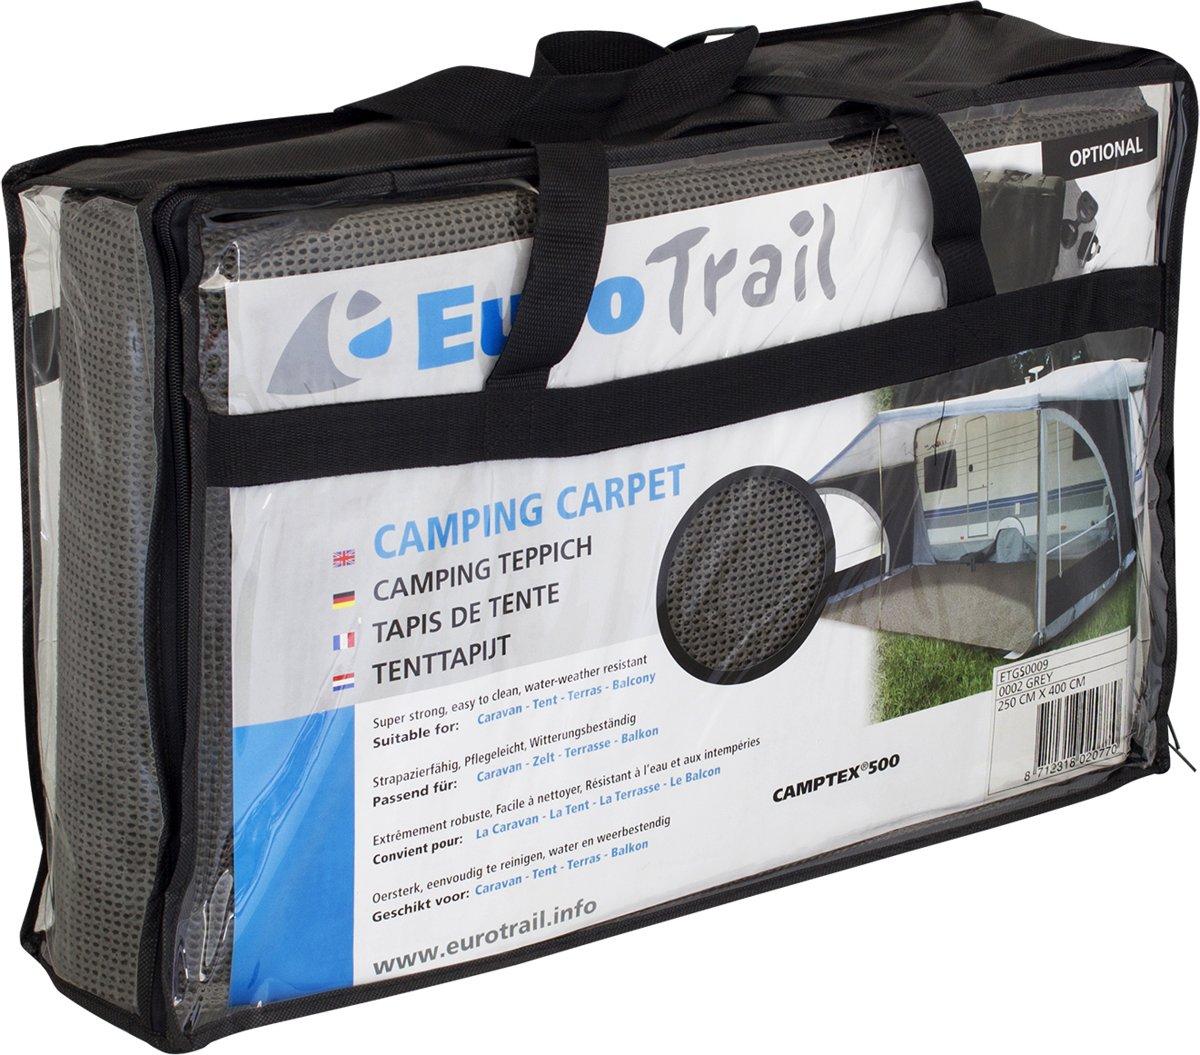 Eurotrail Camptex Tenttapijt - 300 x 500 cm - Beige kopen